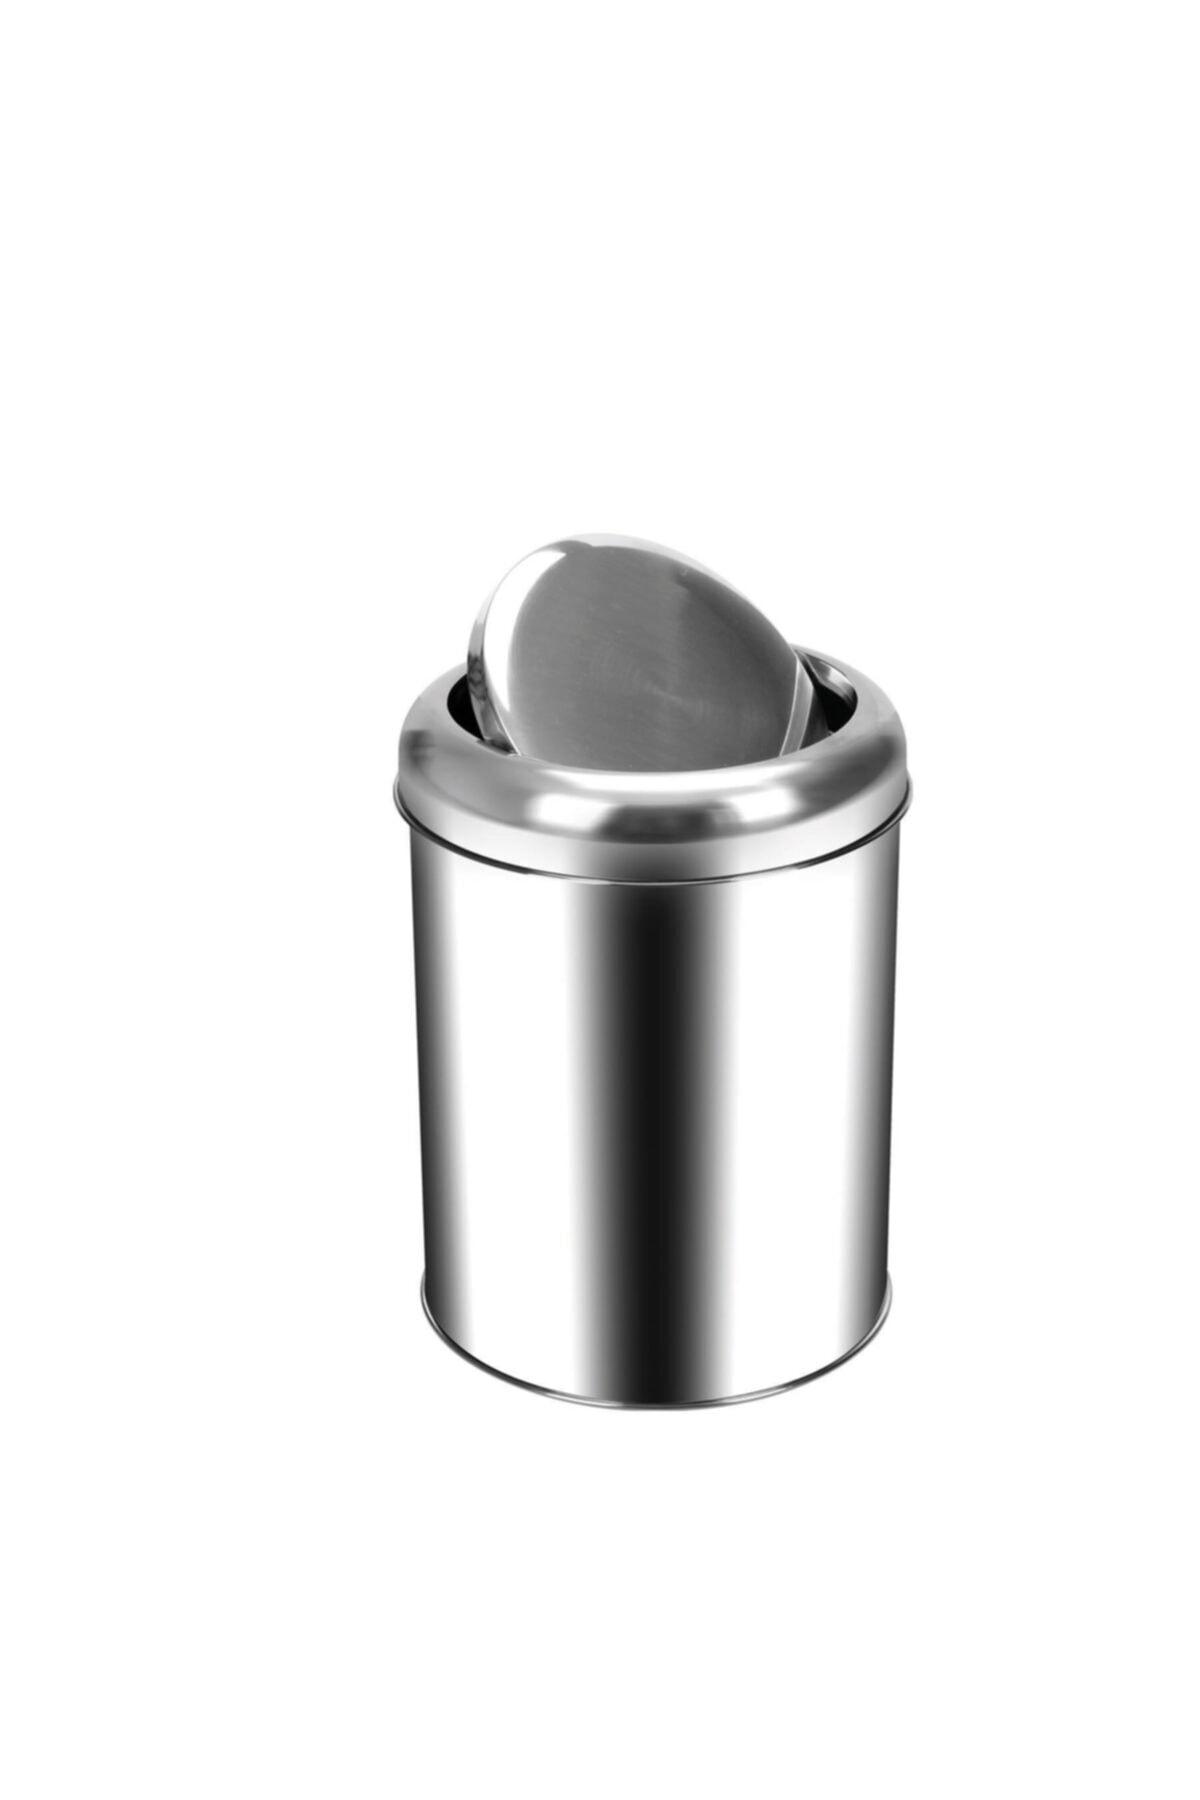 Krom Pratik Kapaklı Çöp Kovası 5 Lt.